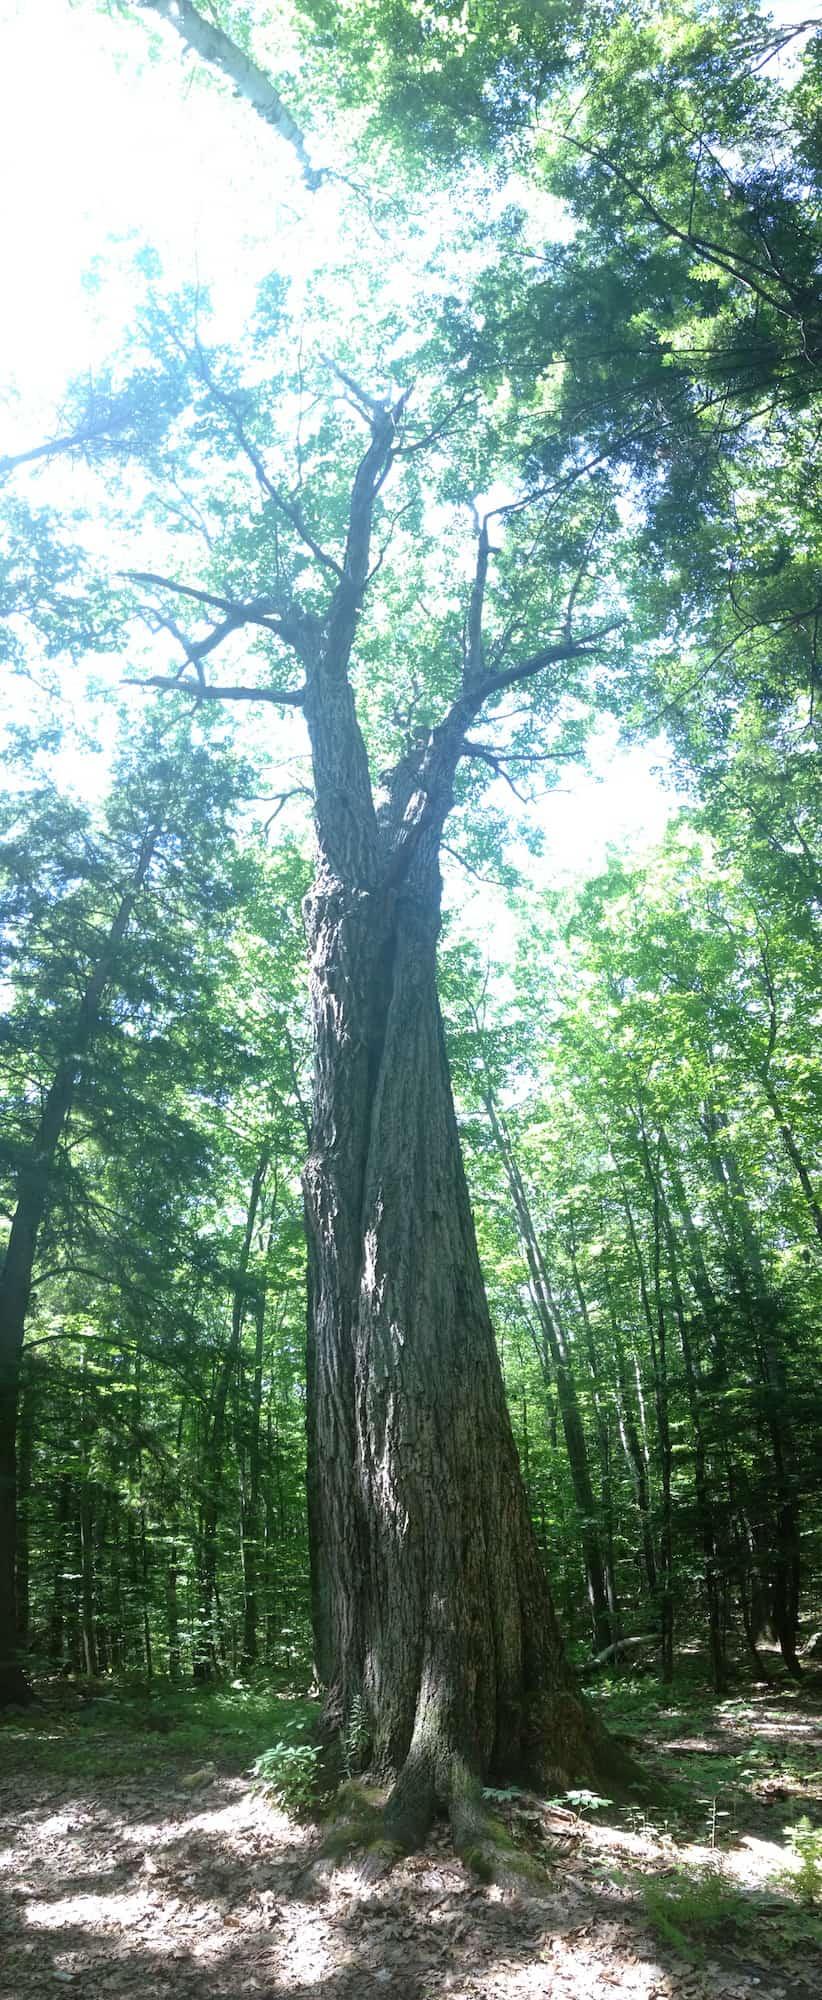 The massive red oak (Quercus rubra) near my friend's house in New Hampshire.